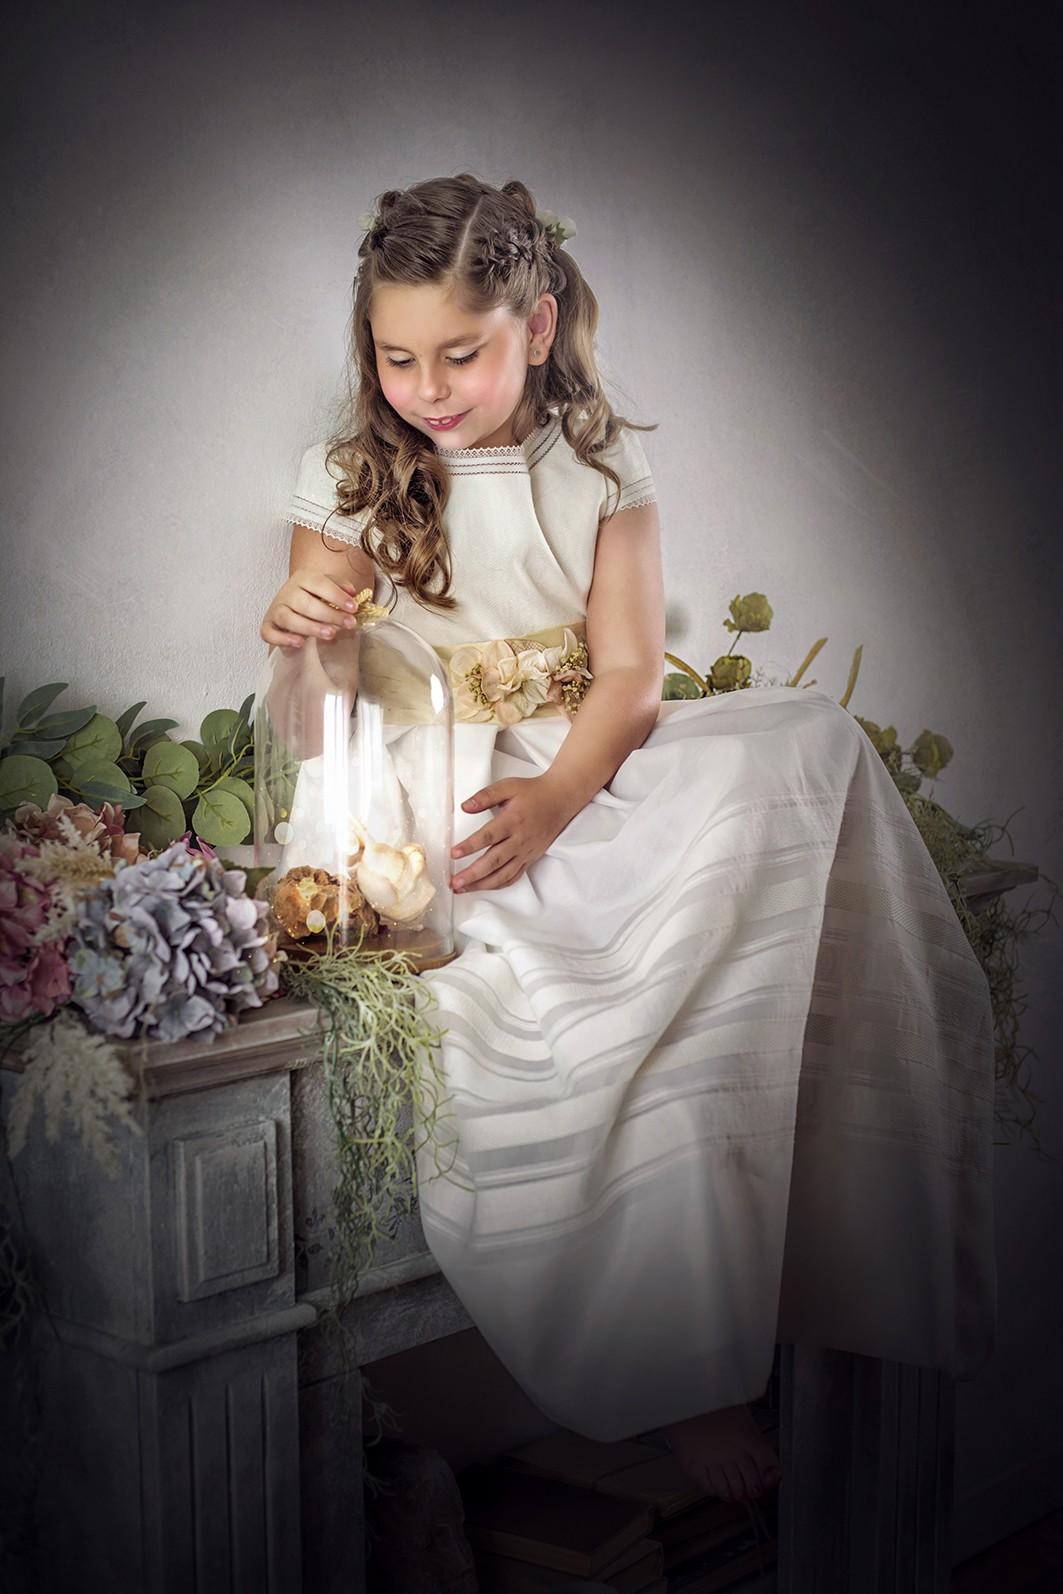 fotografa de niños y familias, comunión Maira 02